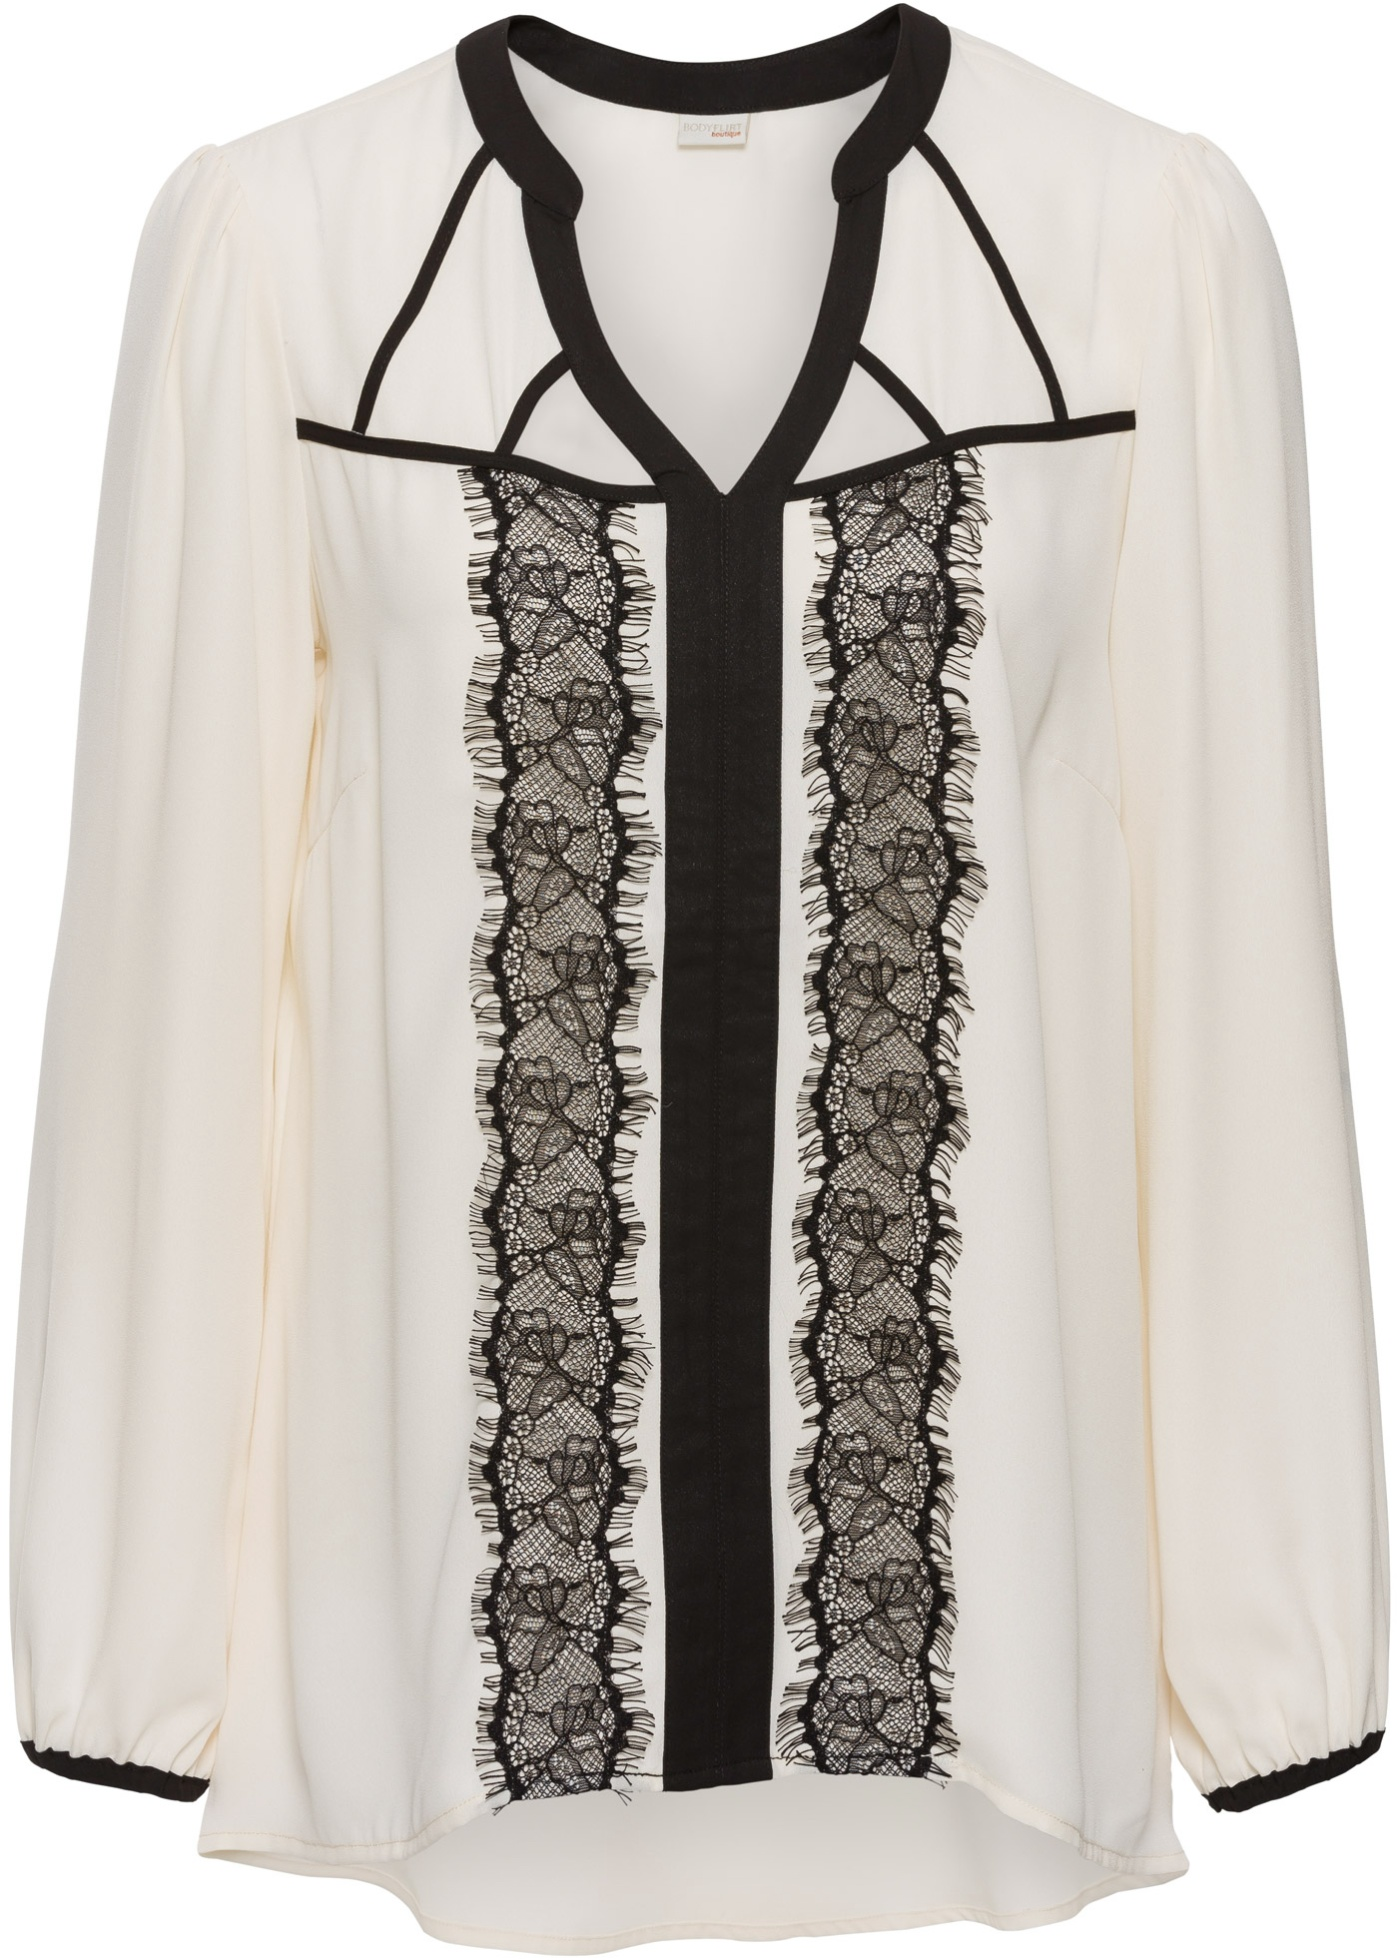 Blusa a manica lunga con pizzo (Bianco) - BODYFLIRT boutique